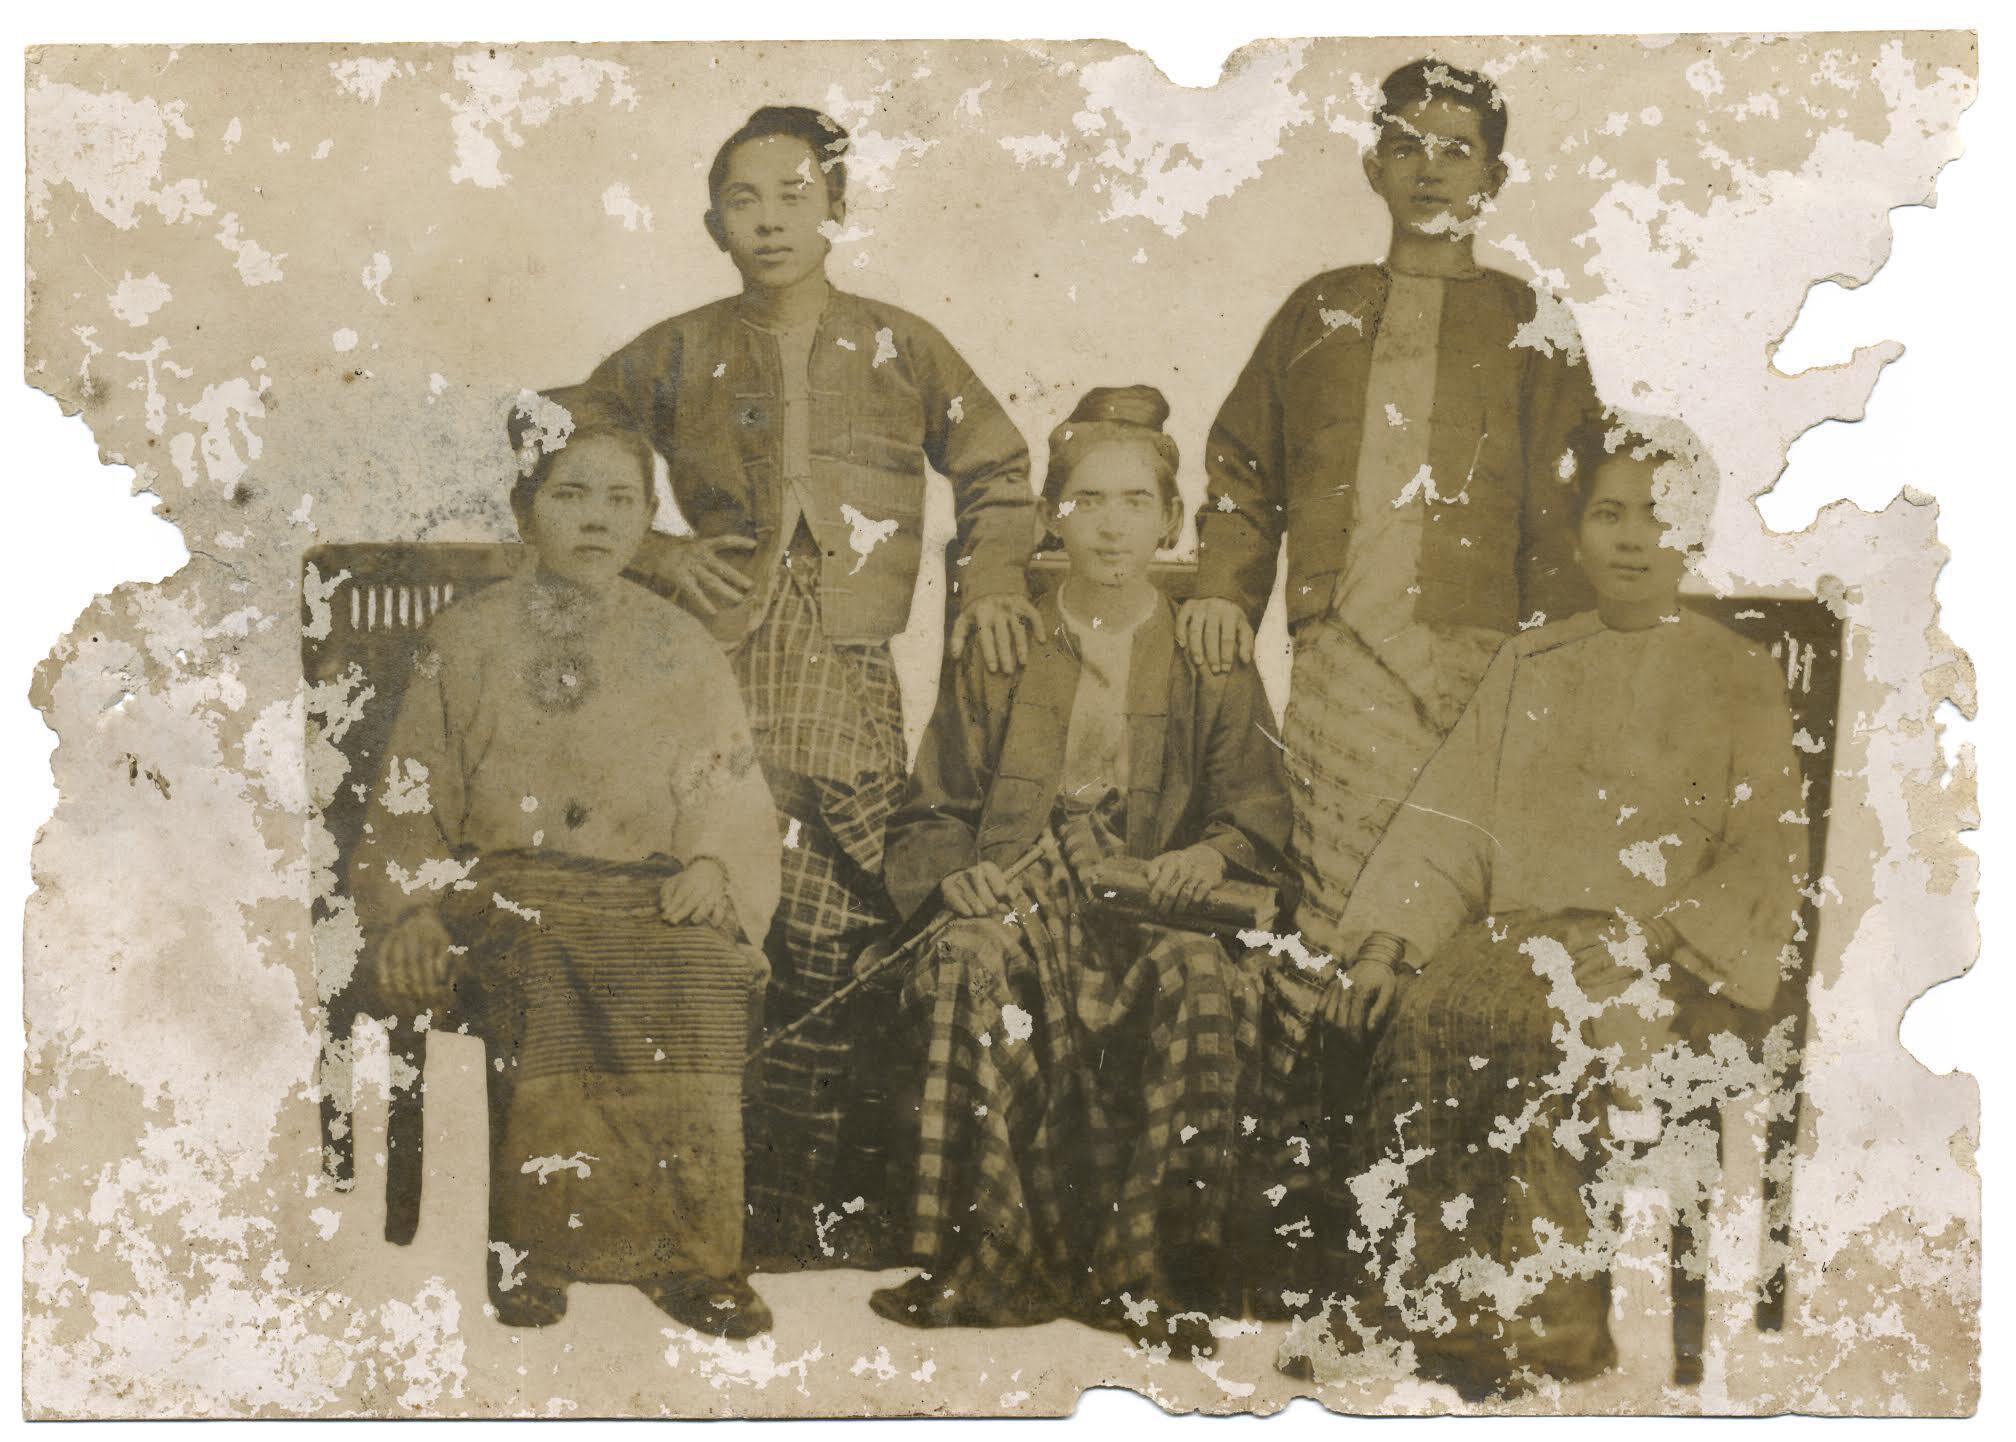 Foto familiar tomada en 1902 en Rangún, Birmania.